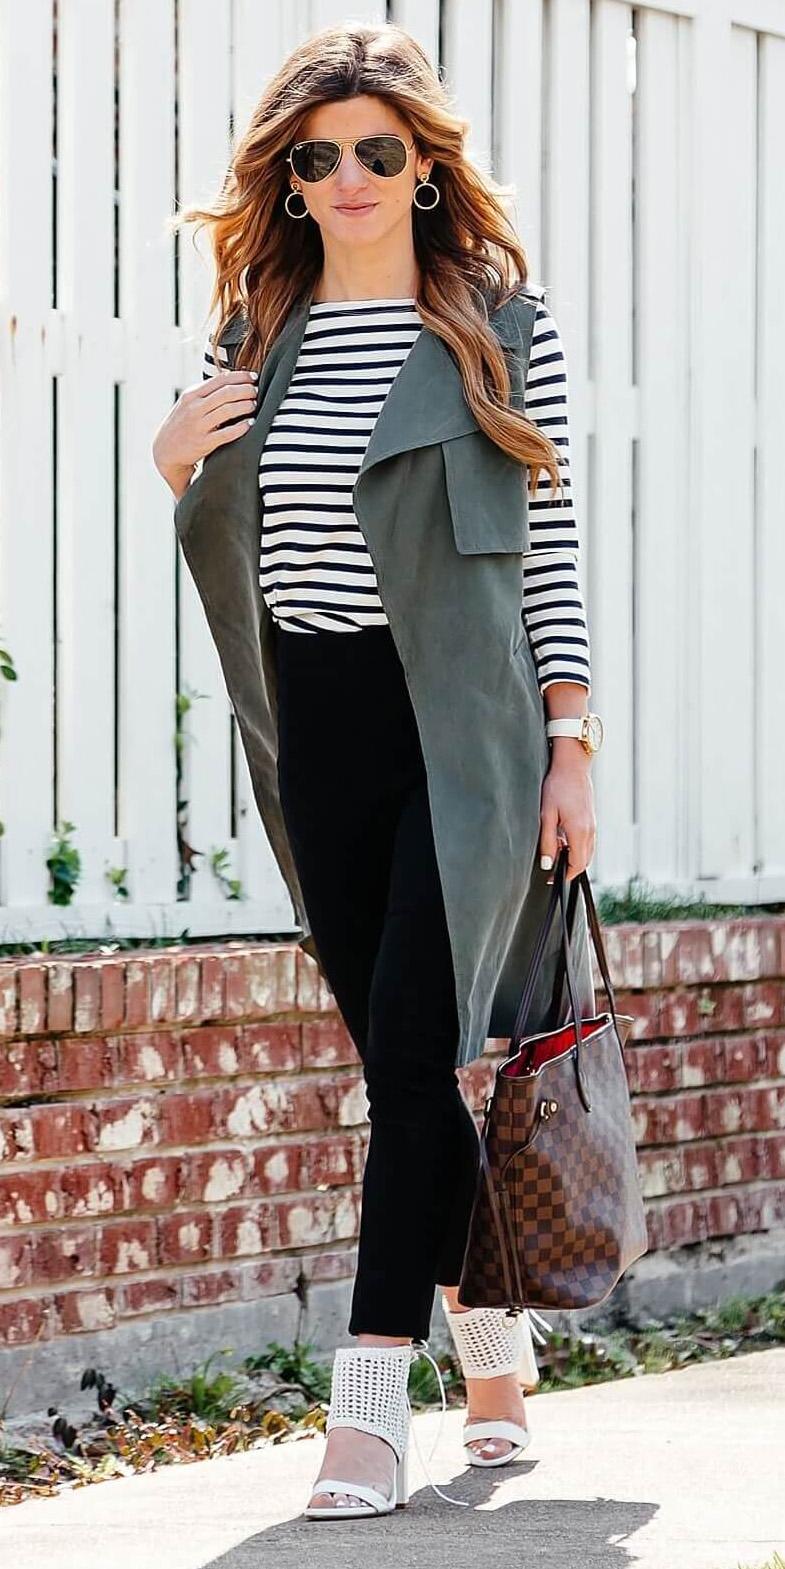 black-slim-pants-black-tee-stripe-hairr-sun-brown-bag-tote-white-shoe-sandalh-green-olive-vest-utility-trench-spring-summer-work.jpg